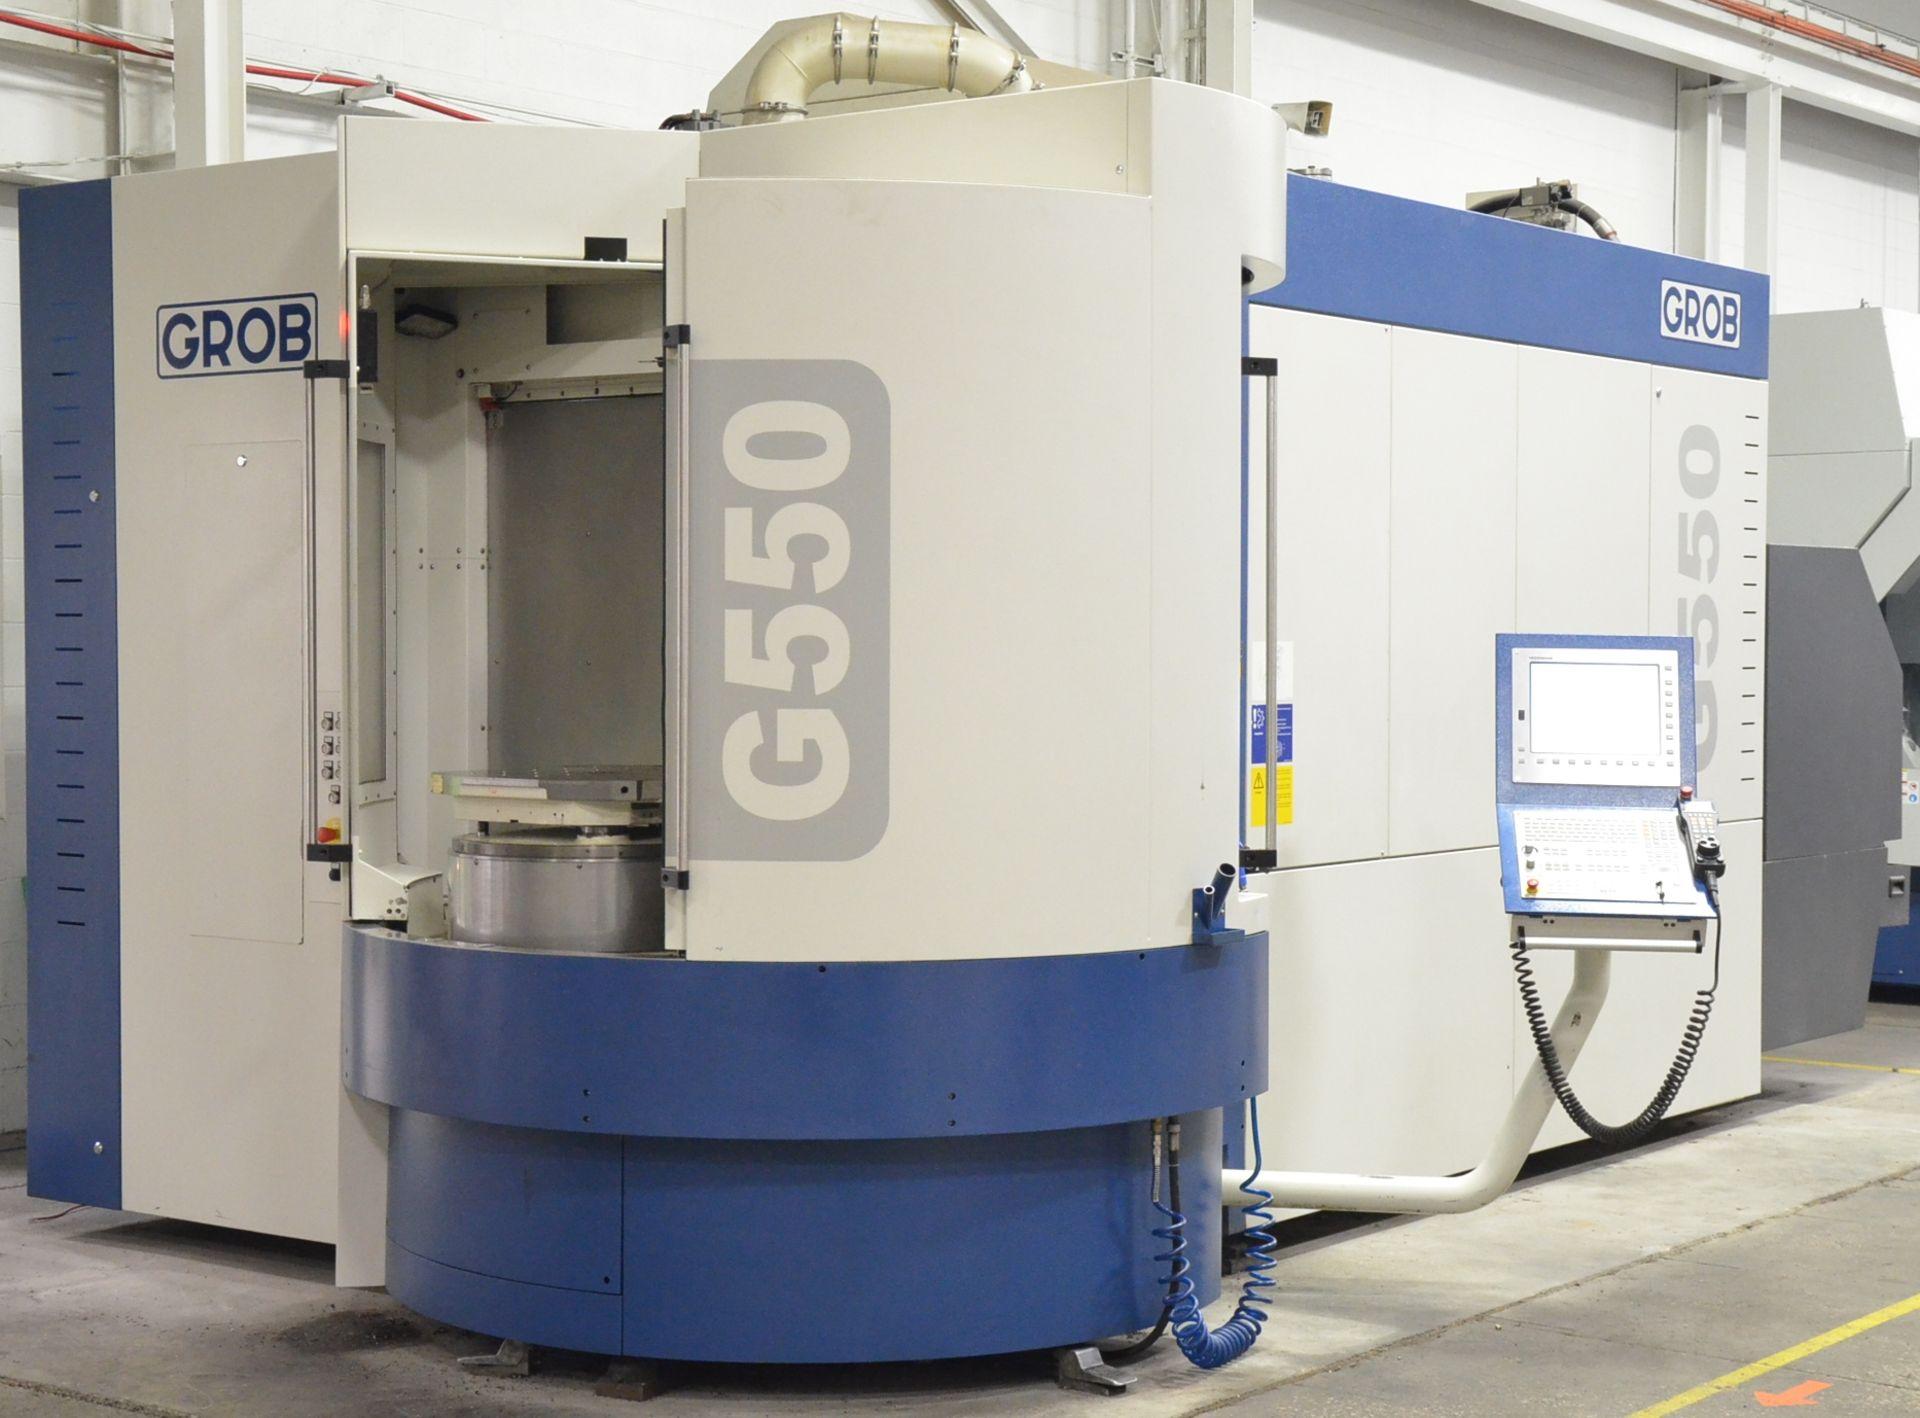 GROB (2014) G550 5-AXIS TWIN PALLET CNC MACHINING CENTER WITH HEIDENHAIN ITNC 530 CNC CONTROL, 24.